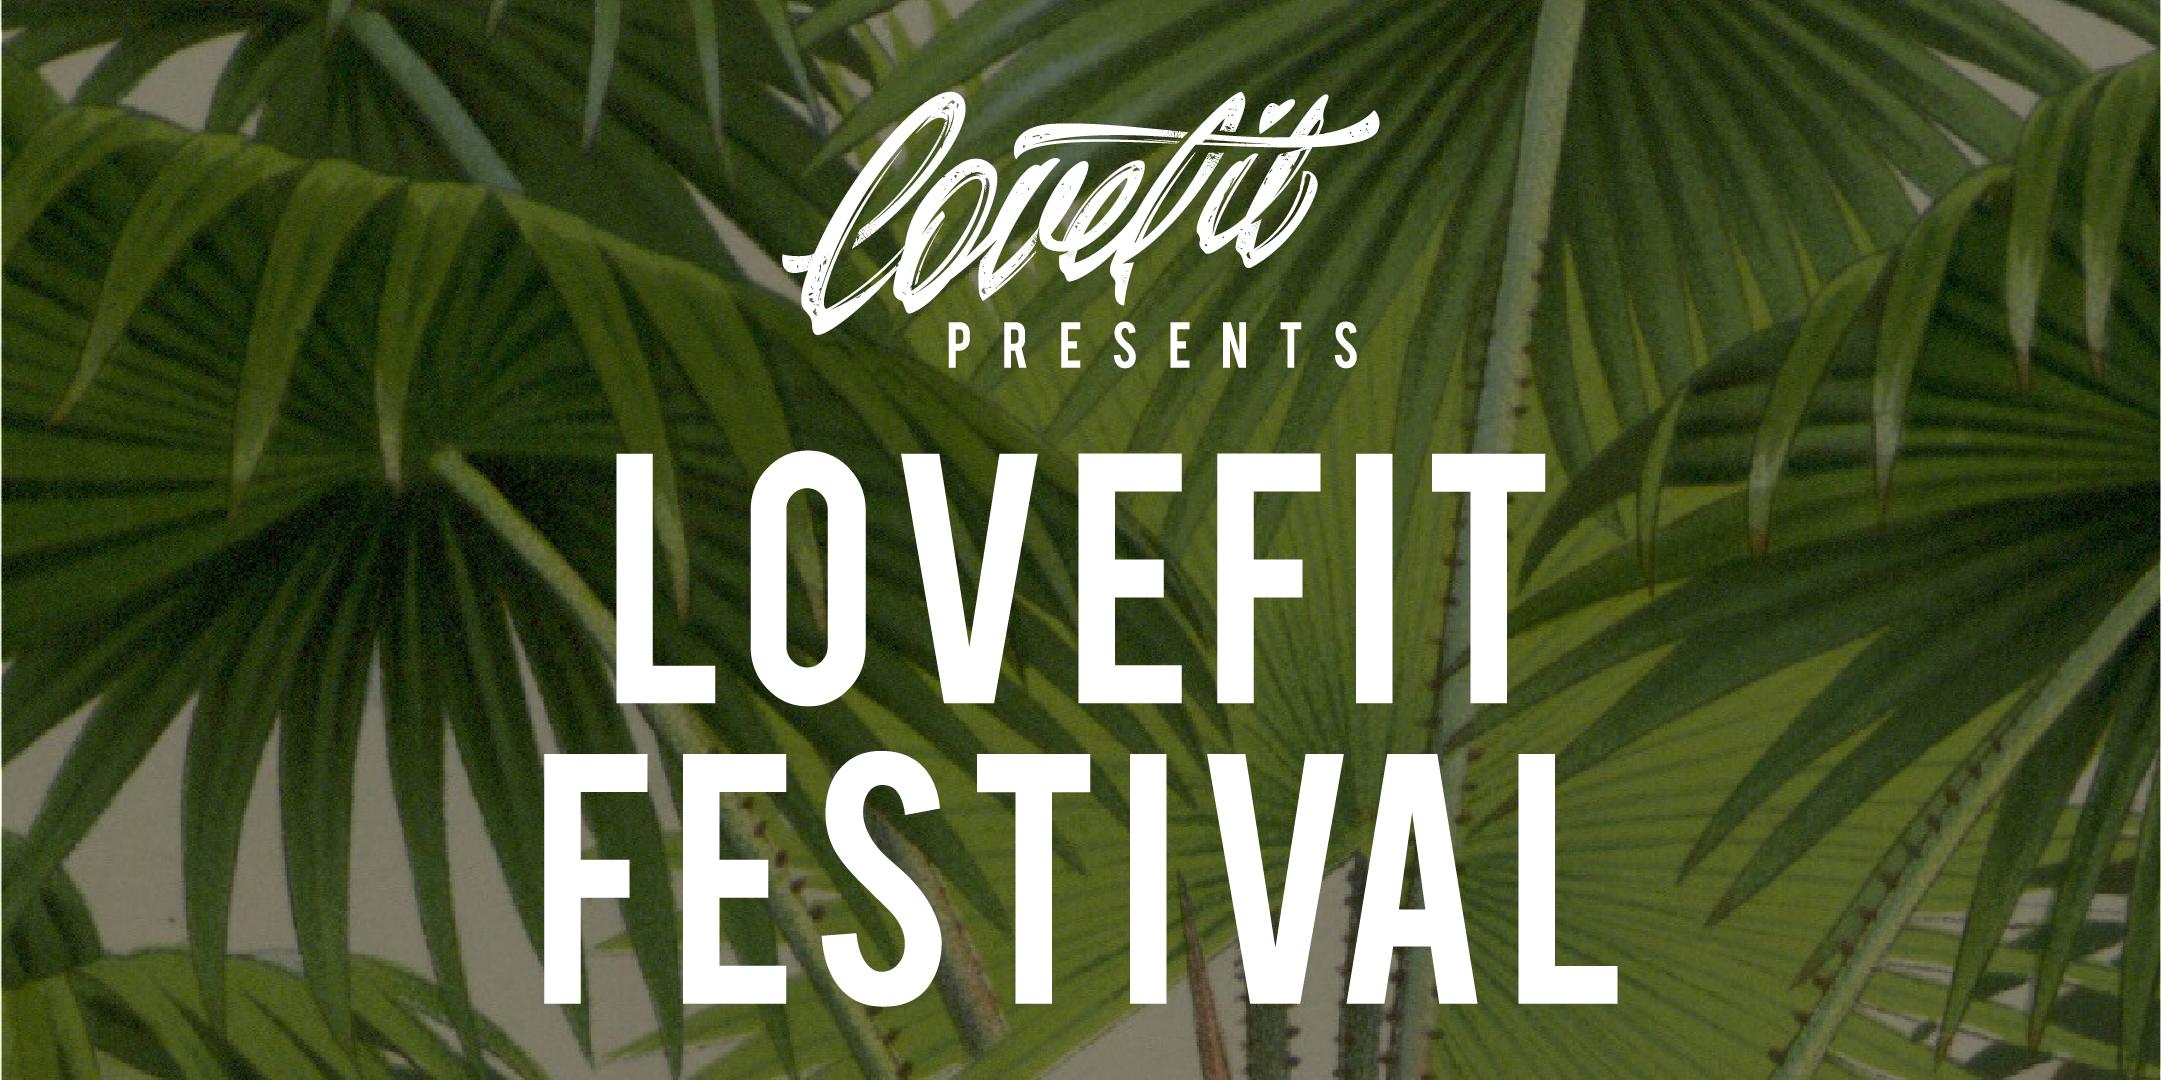 LoveFit 2017: Music & Fitness Festival